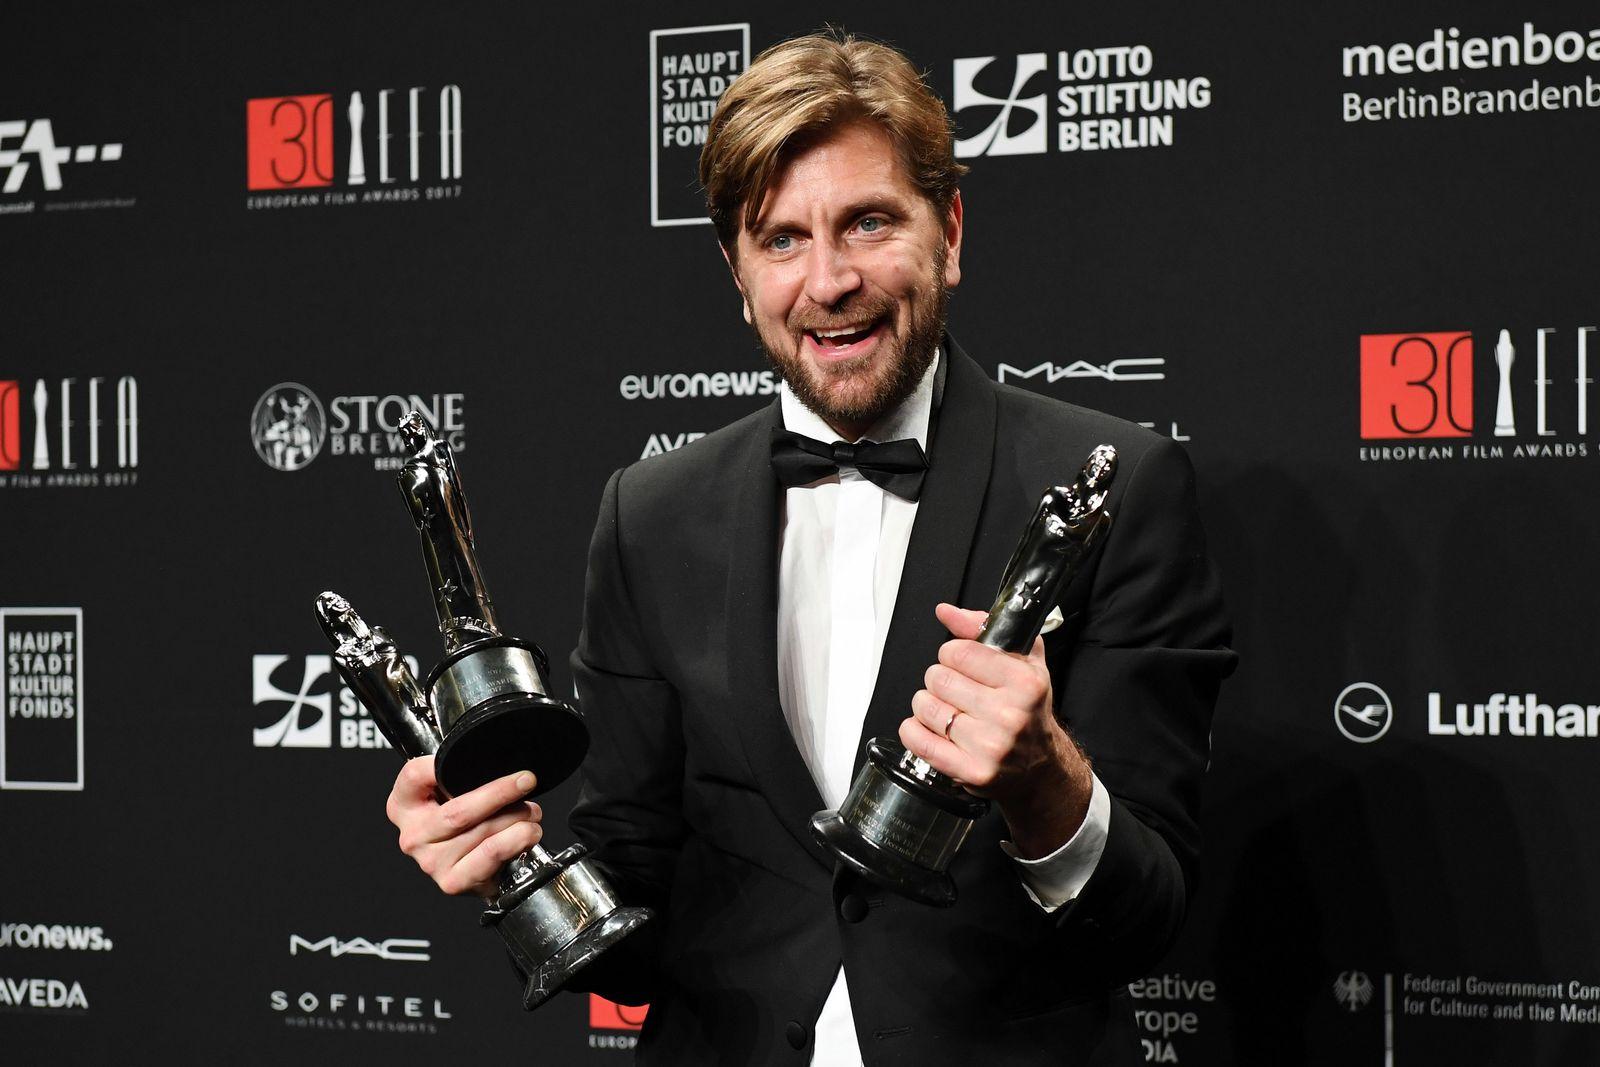 Verleihung 30. Europäischer Filmpreis